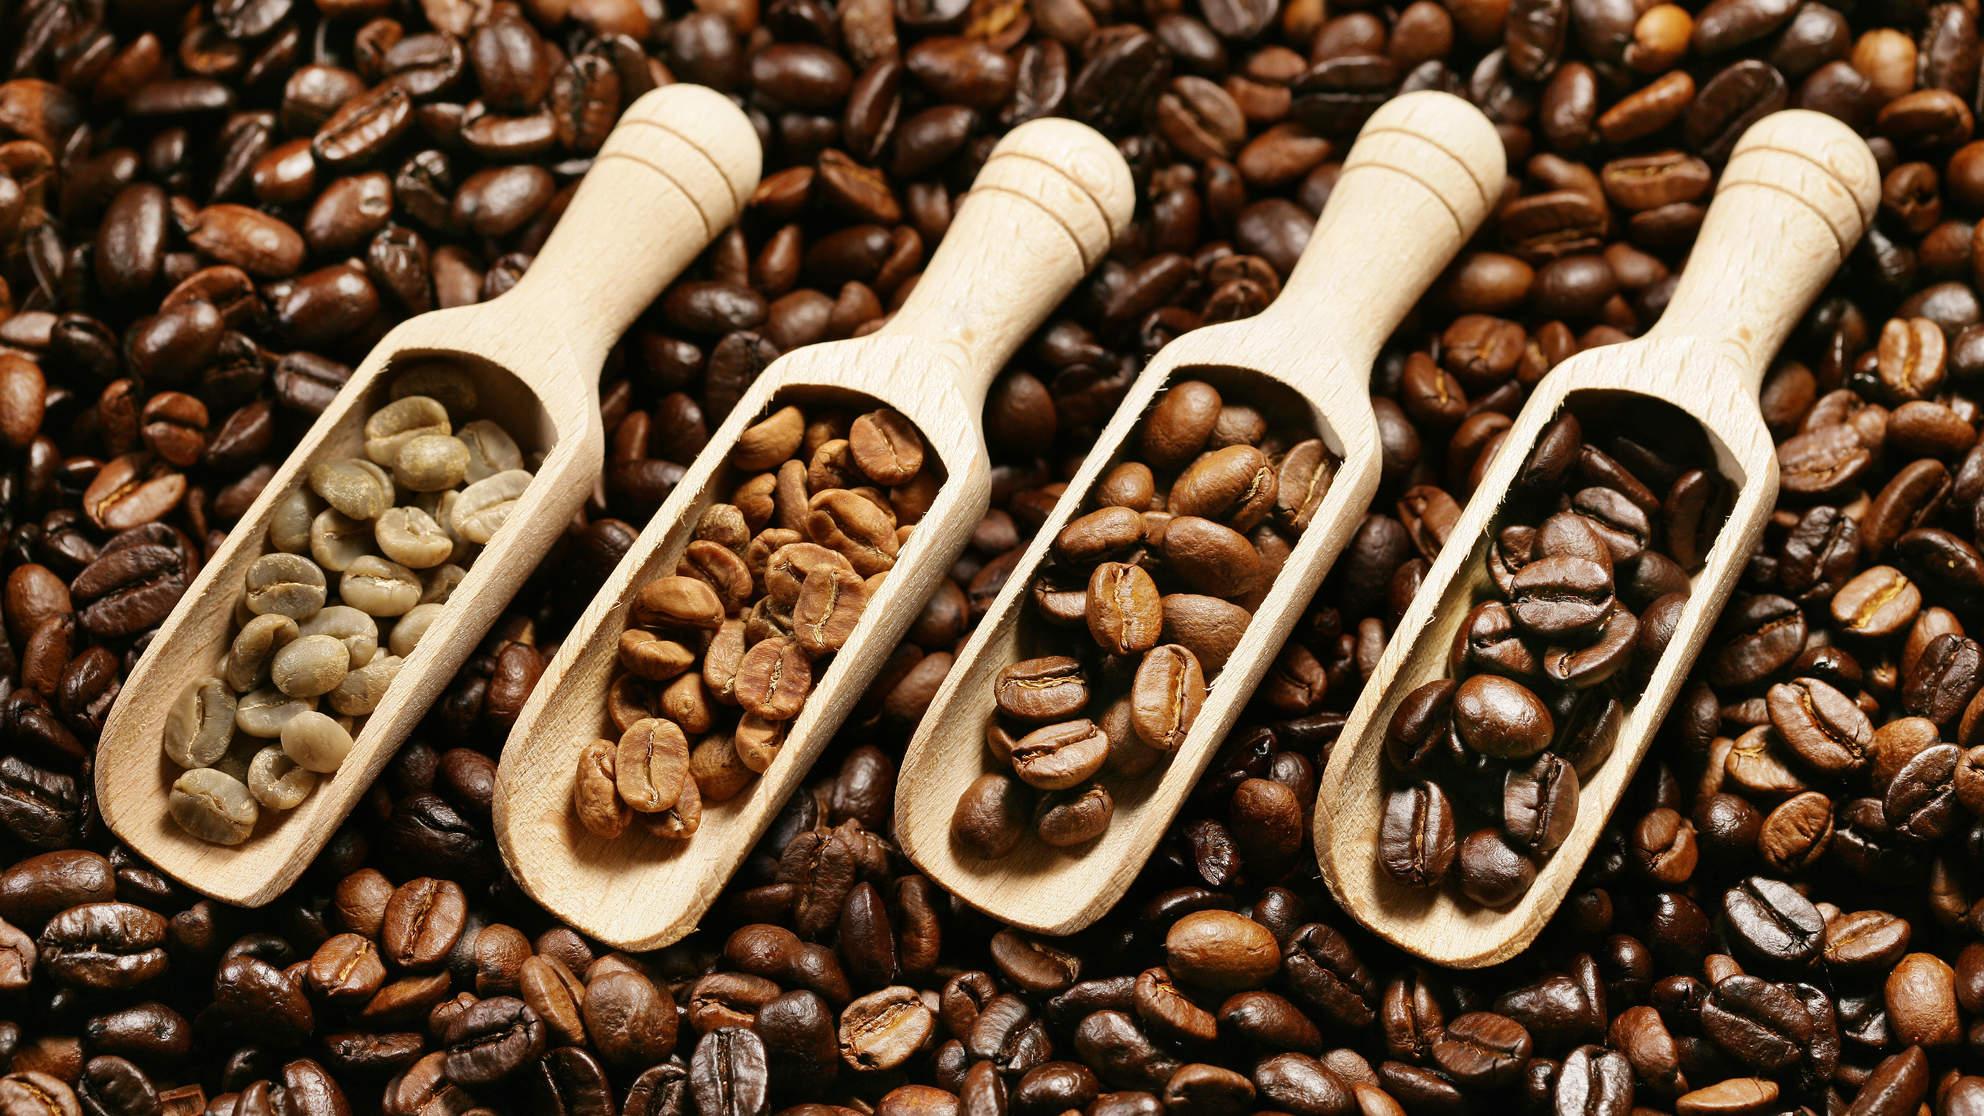 Light Roast vs. Dark Roast Coffee: Which Is Healthier? - Health